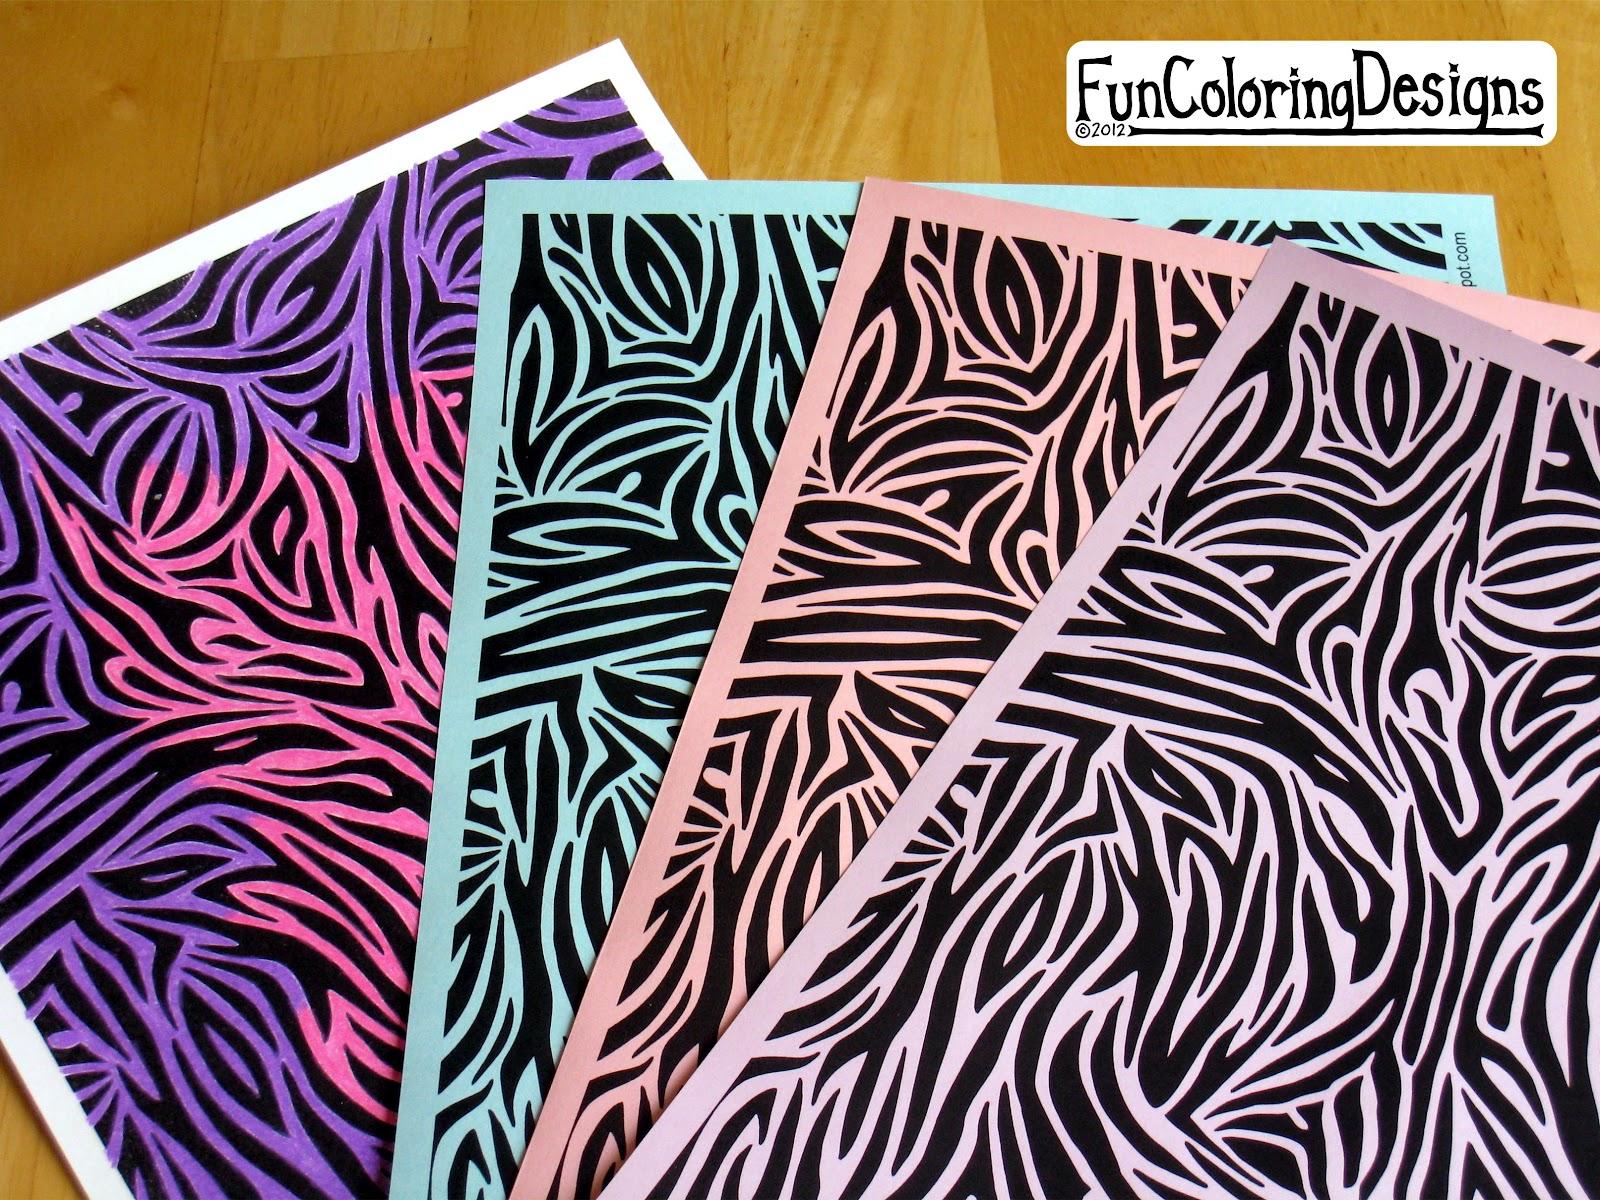 Colorful animal print designs & Colorful animal print designs - crazywidow.info